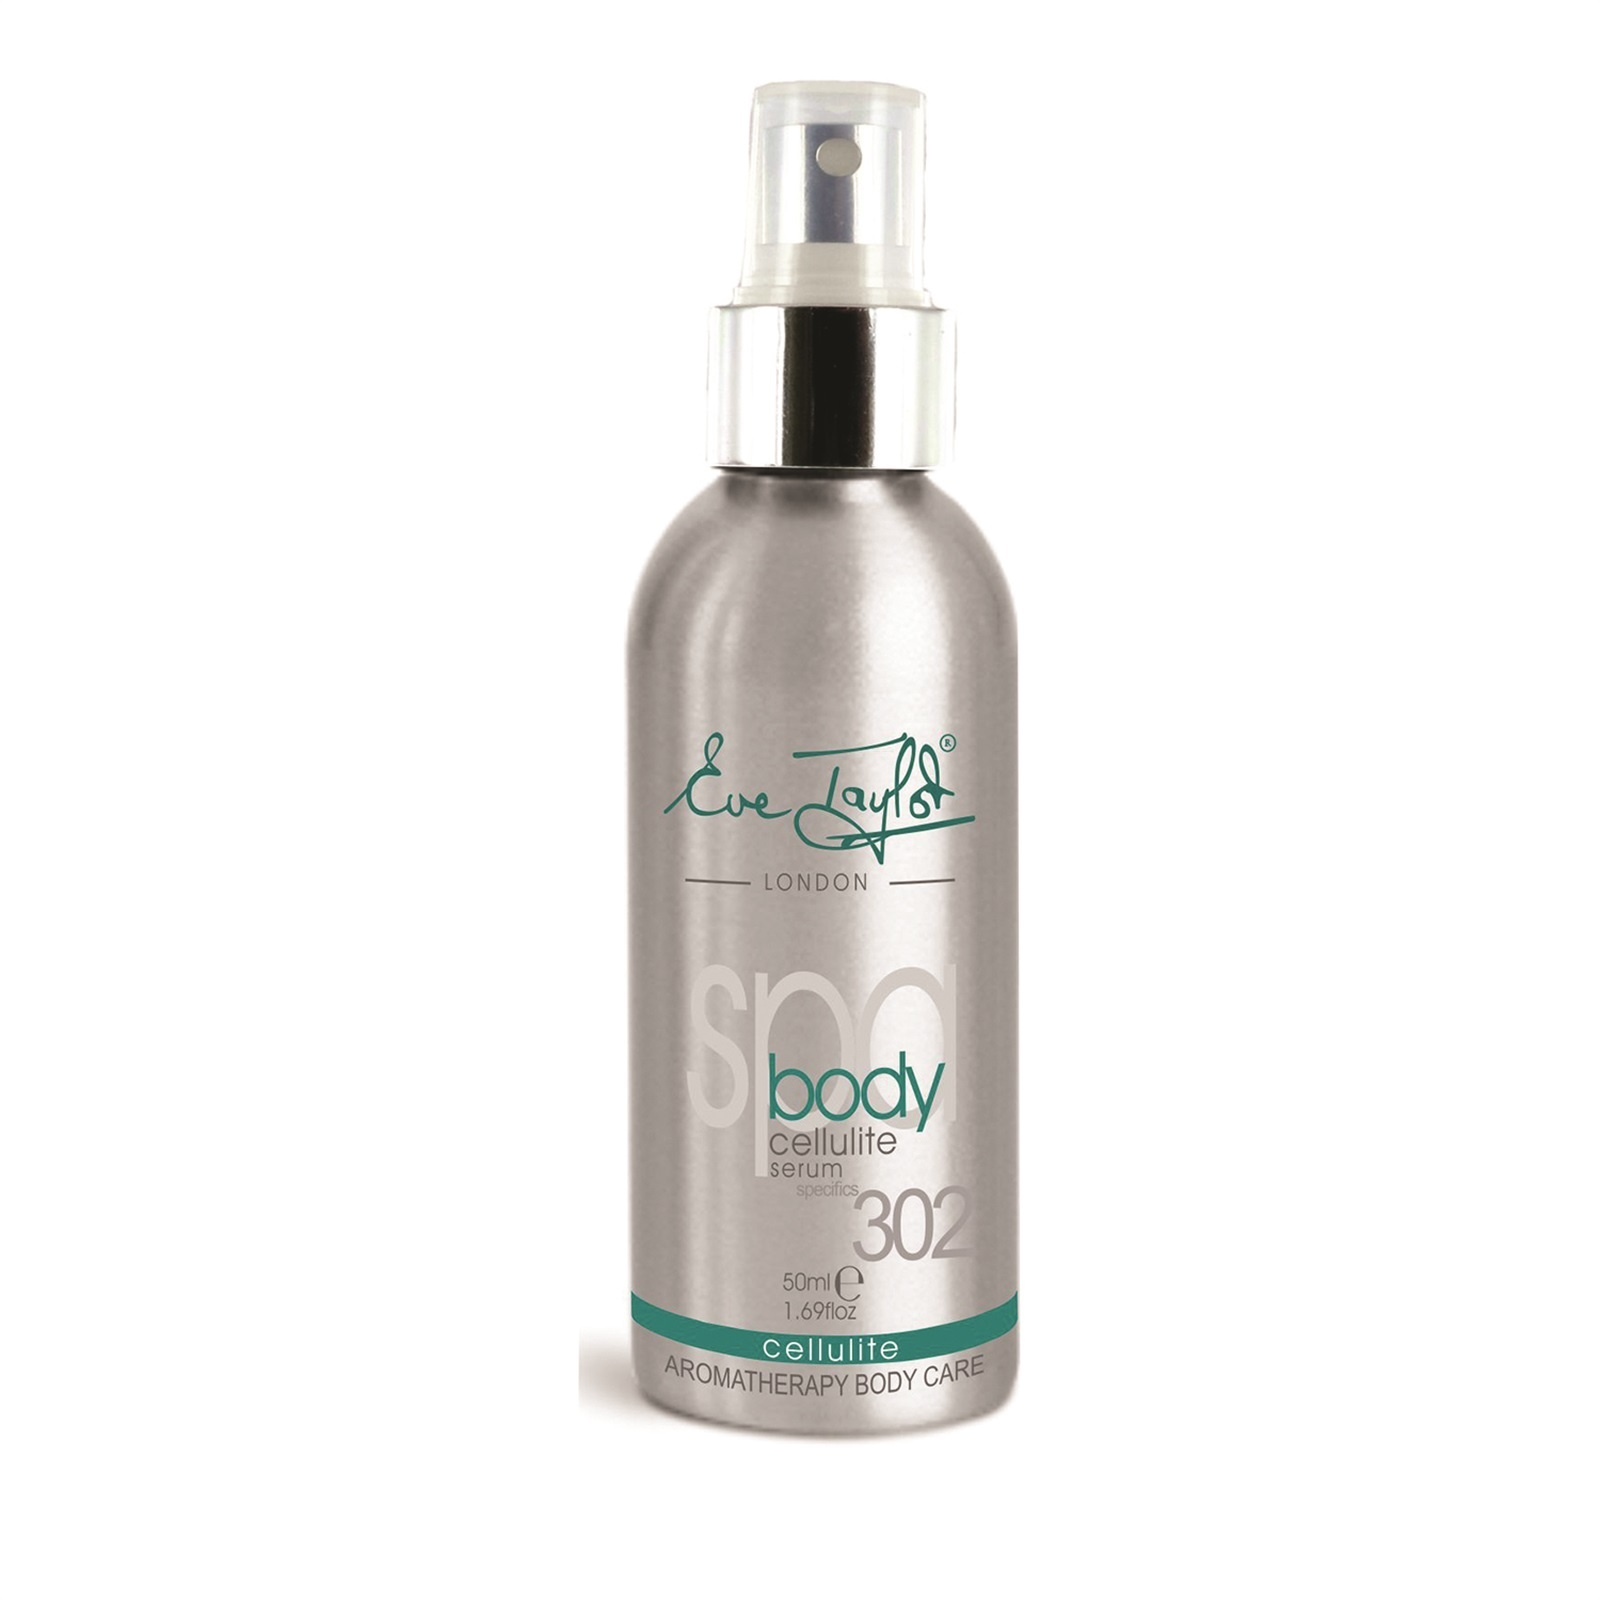 Eve Taylor Body Oil Specifics 302 Cellulite - Eve Taylor